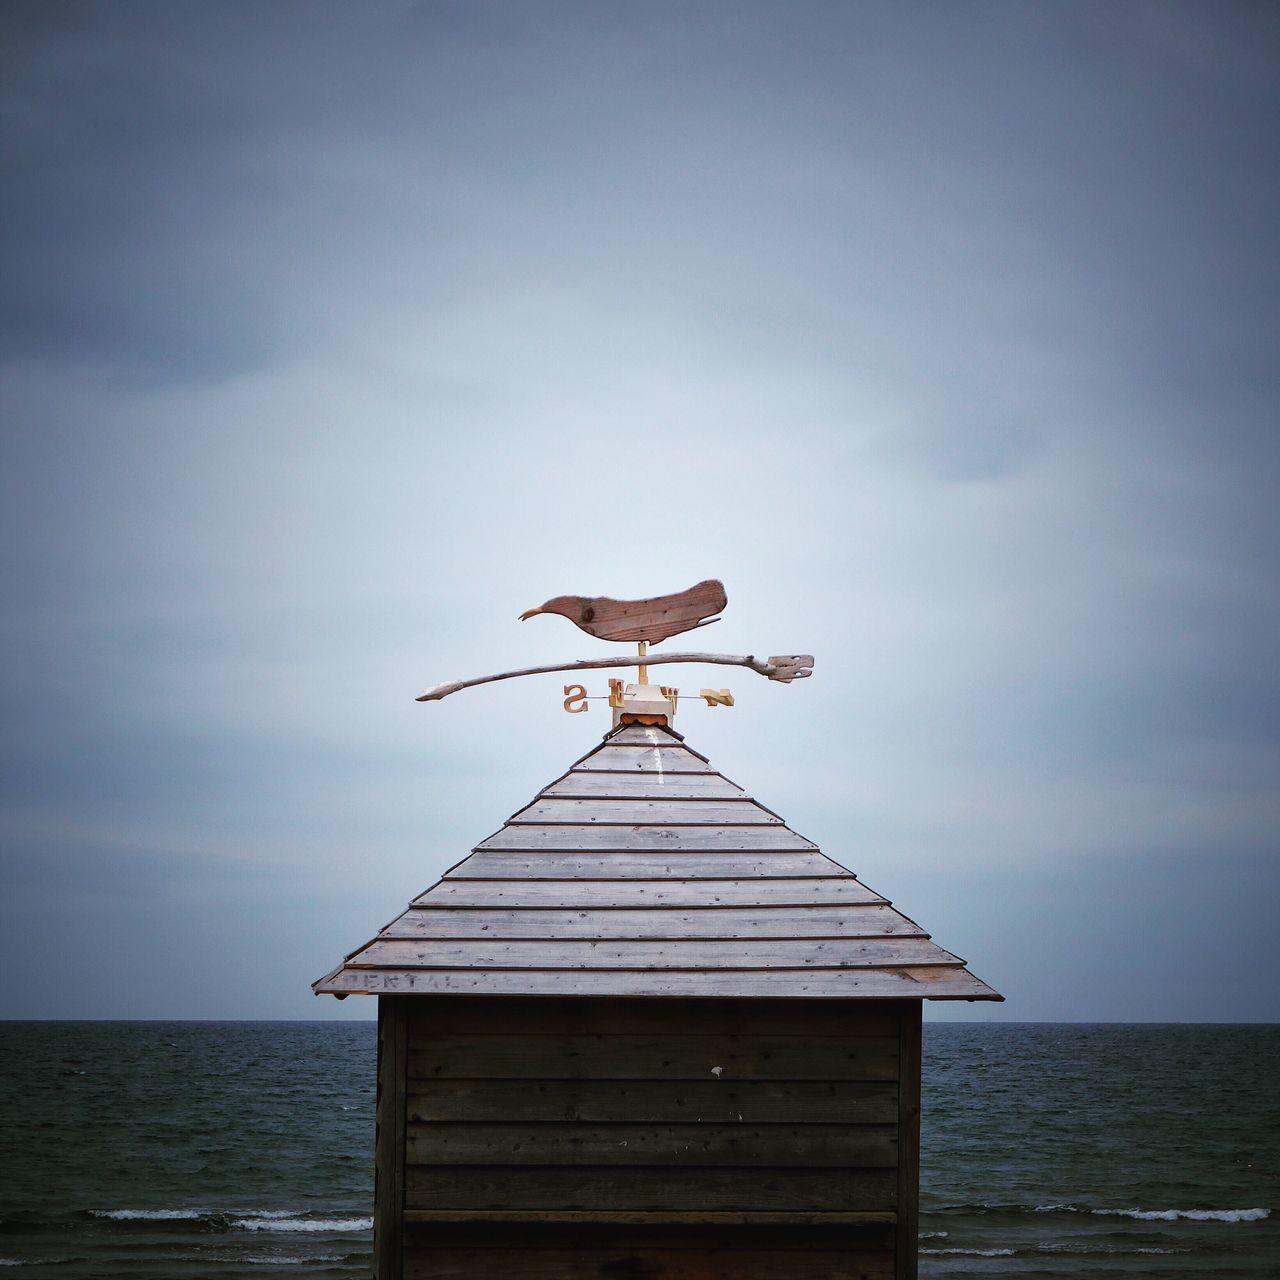 Weathercock Beach Beachphotography Beach Photography